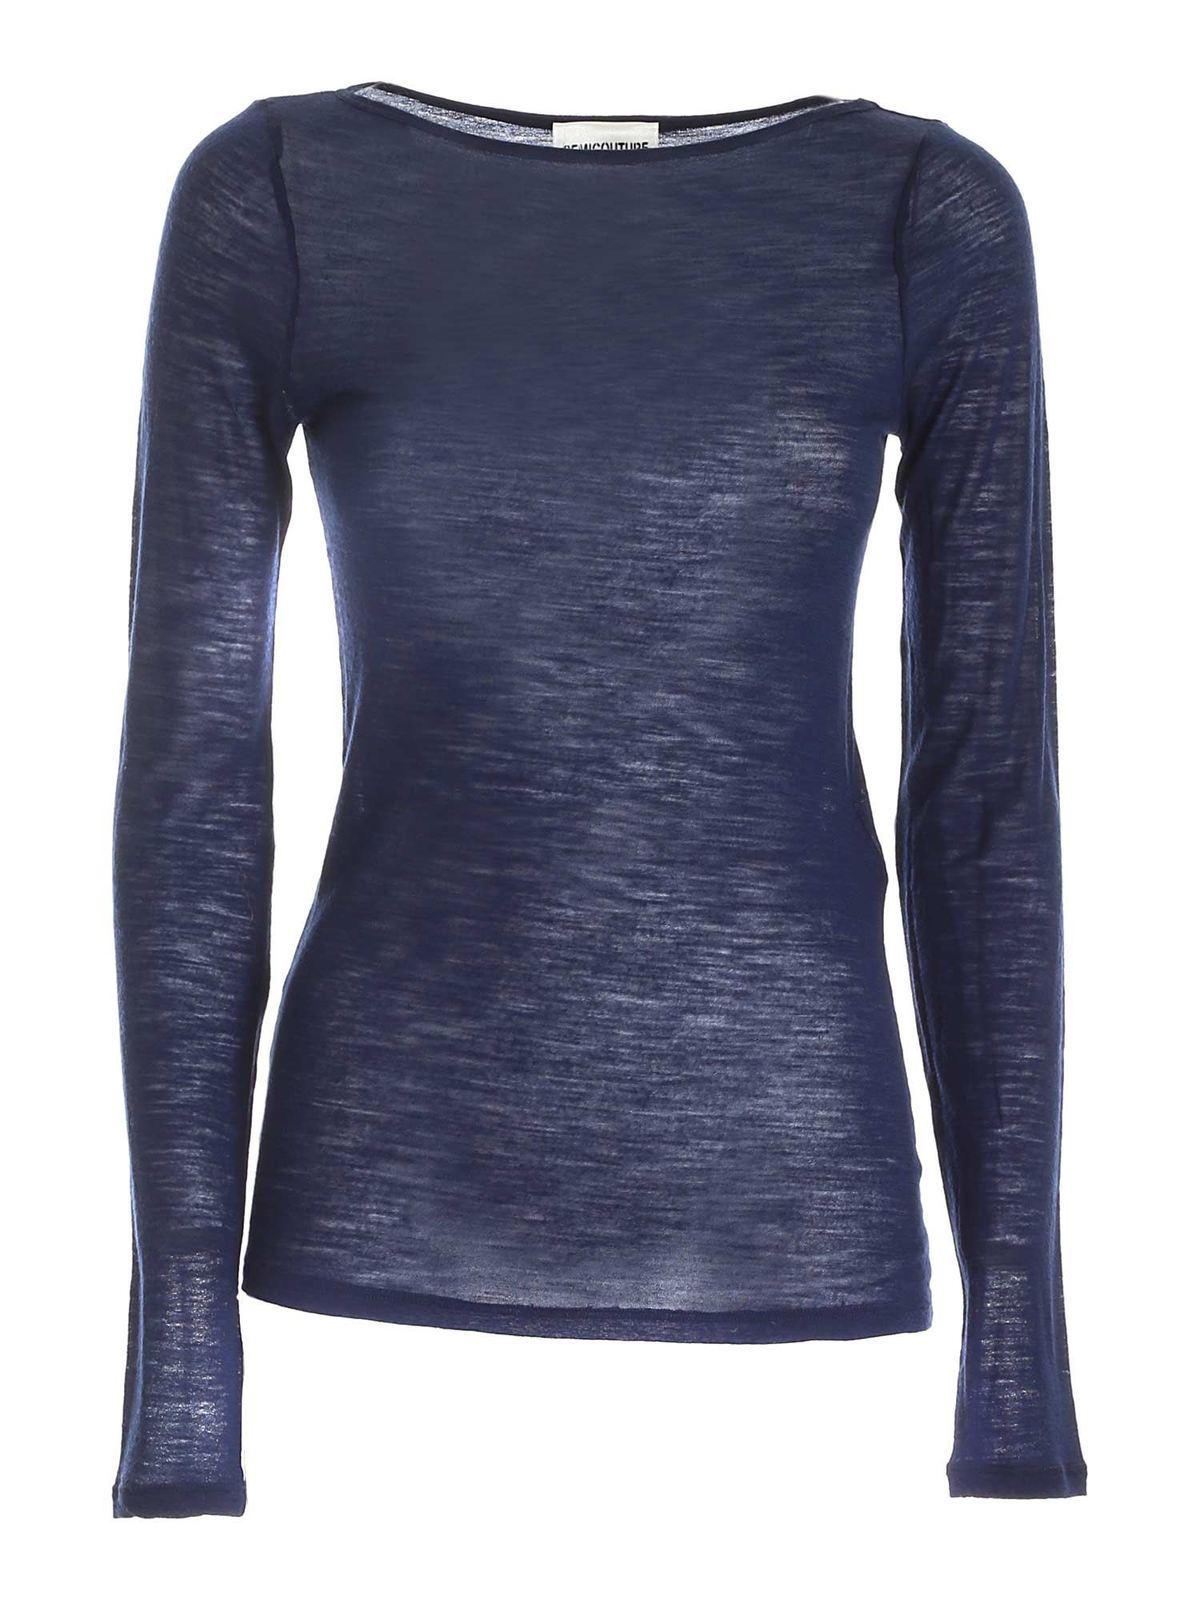 Semicouture BLANDINE T-SHIRT IN BLUE